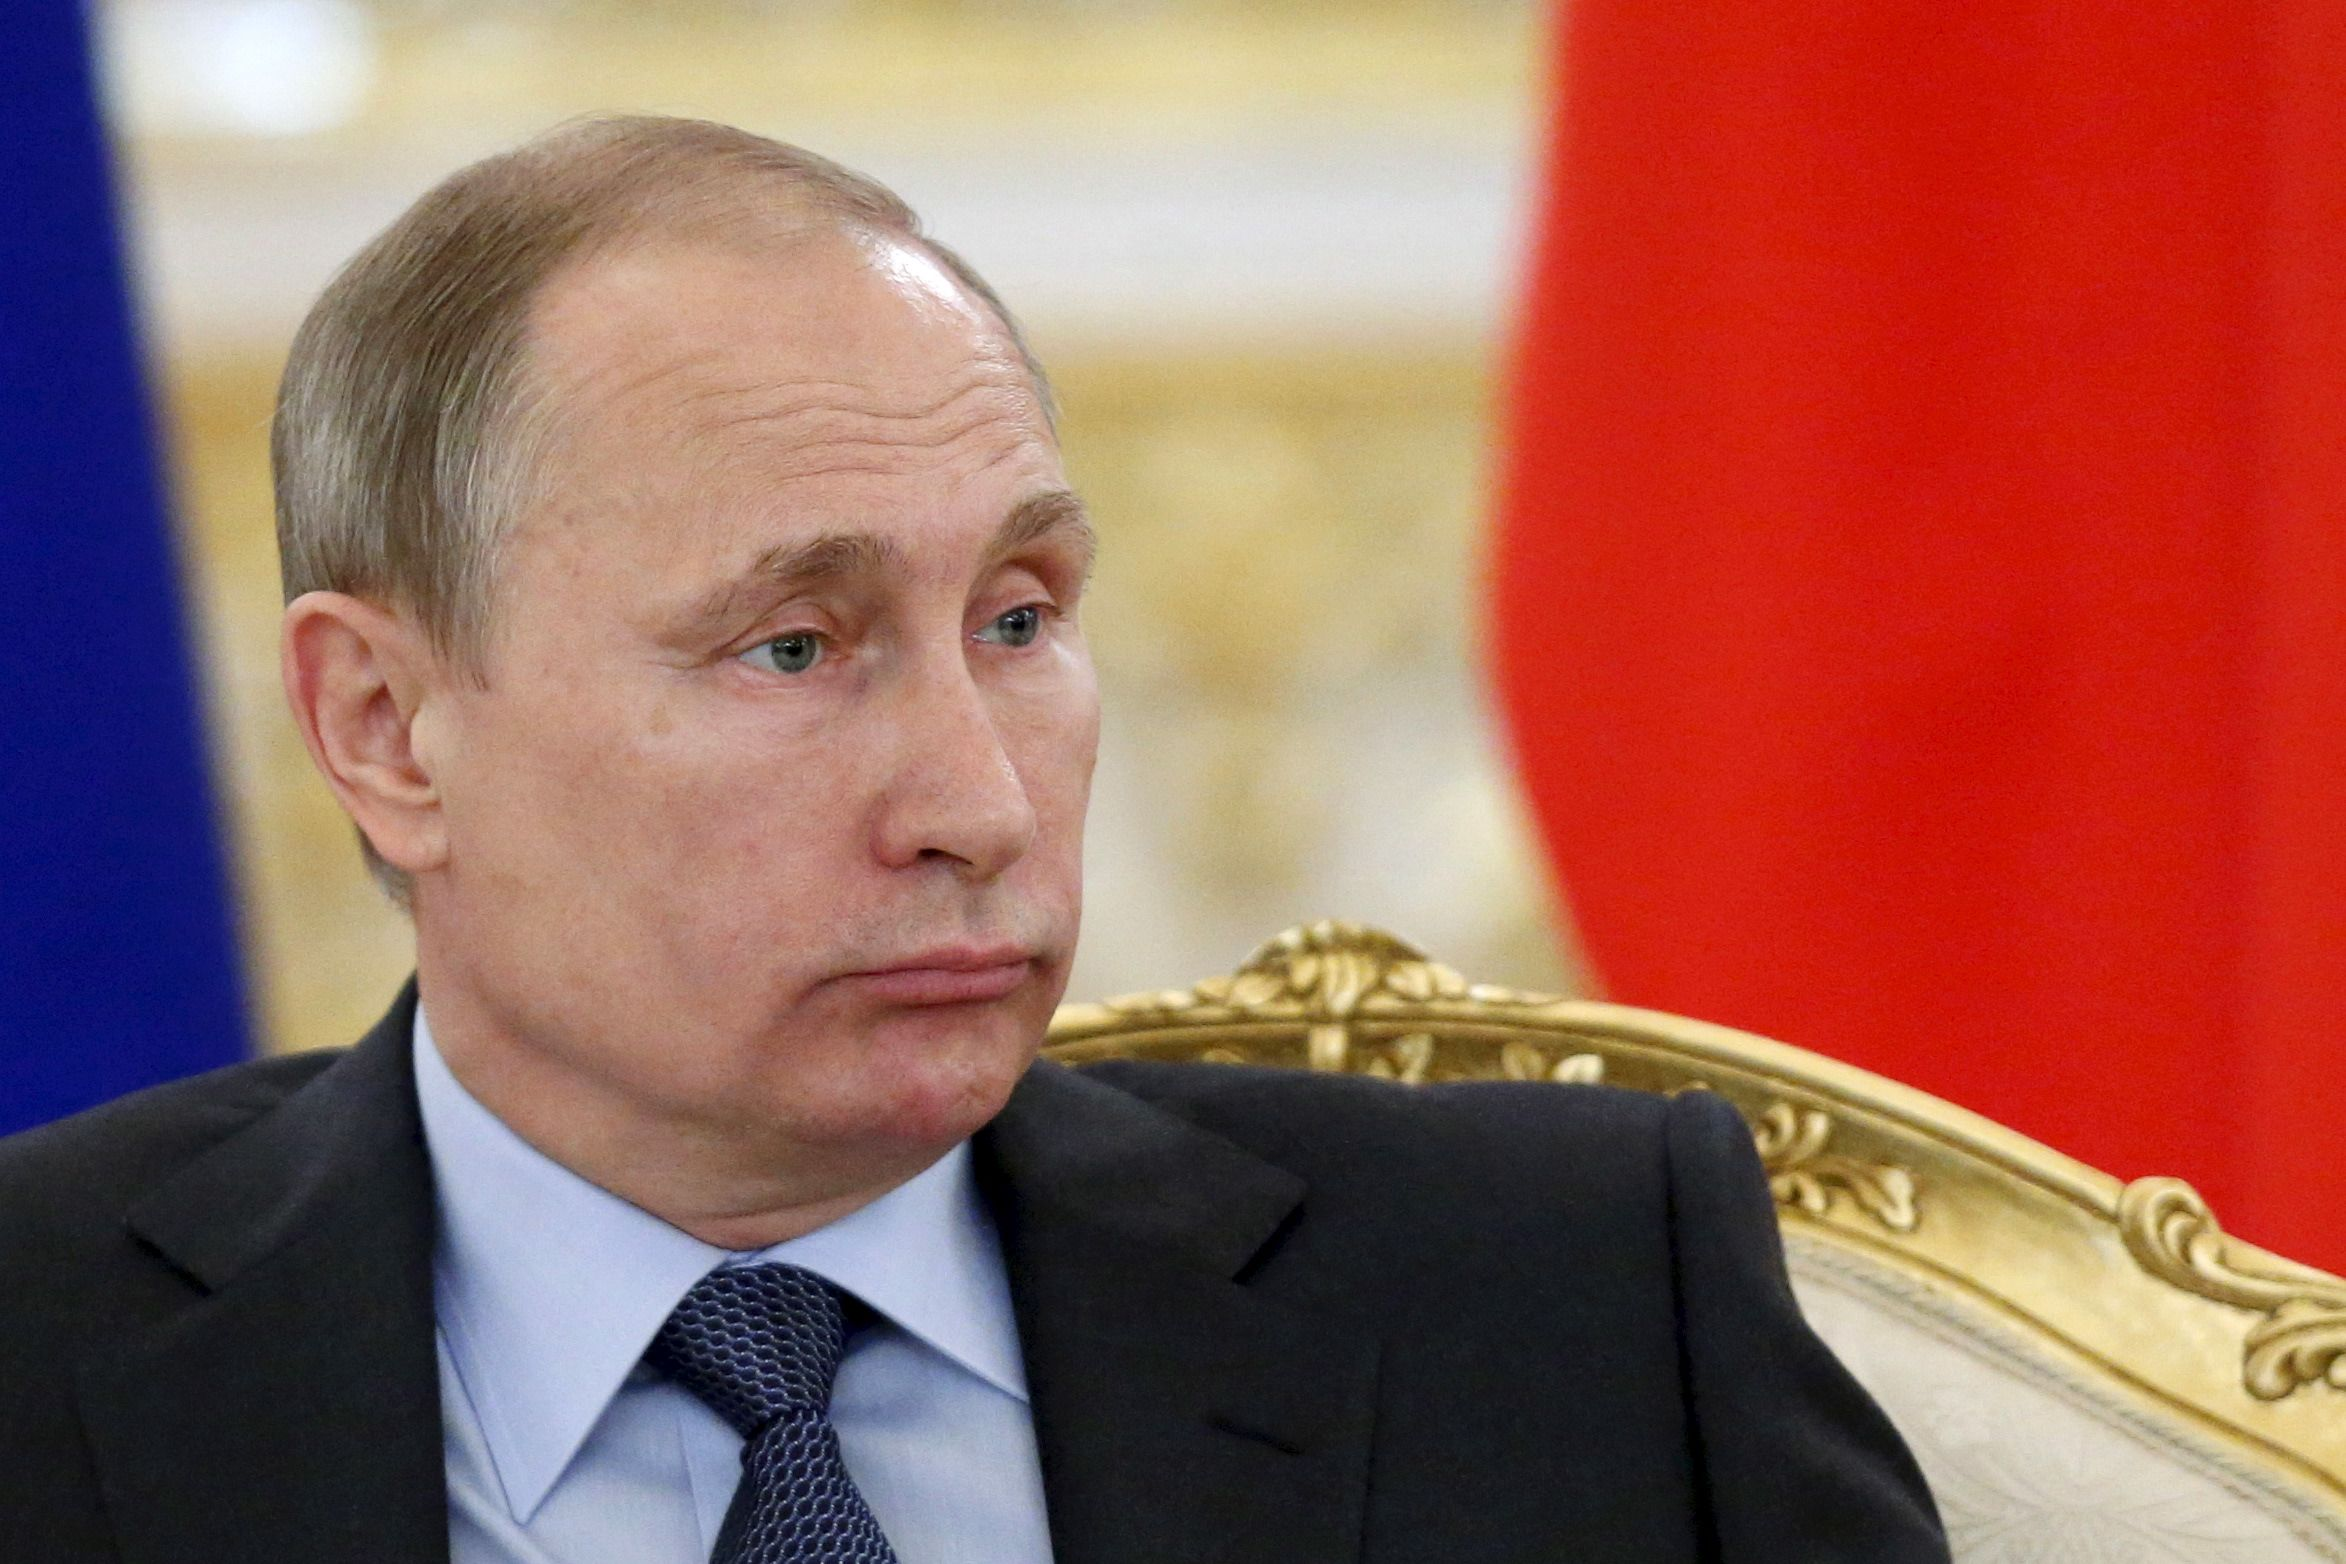 Putin Meets Economic Collapse With Purges, Broken Promises